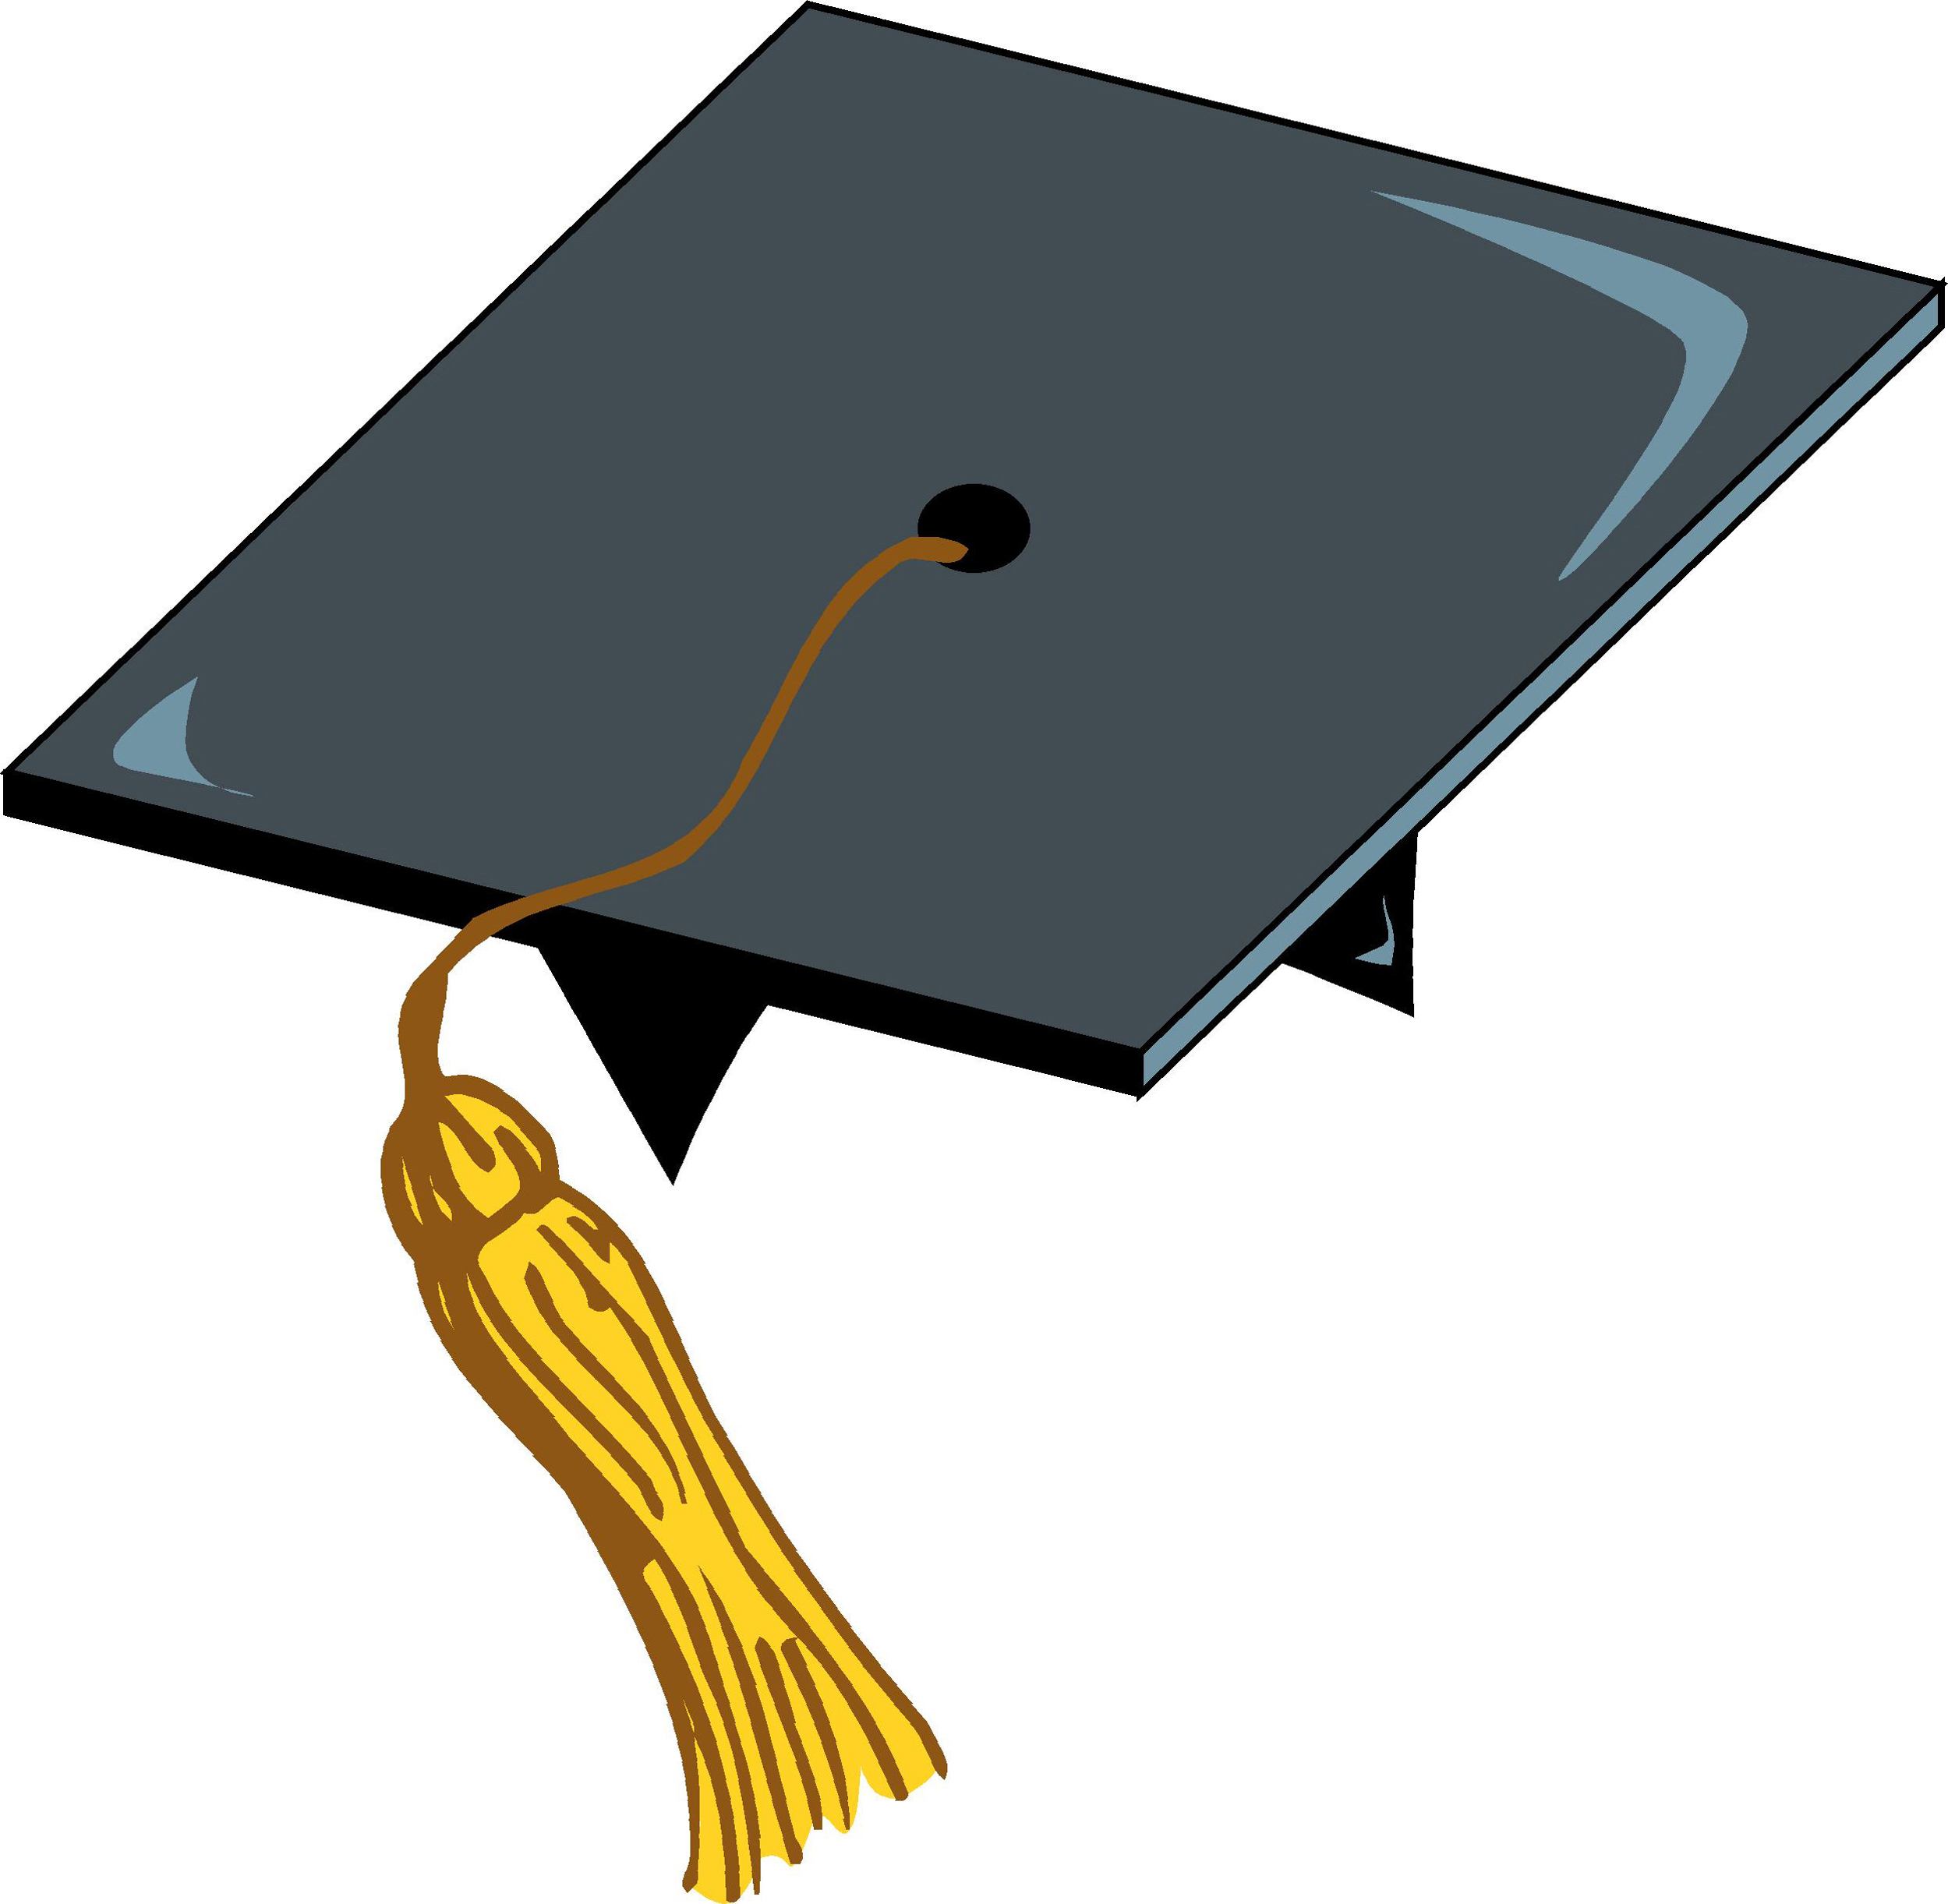 College clipart valedictorian. Clip art library